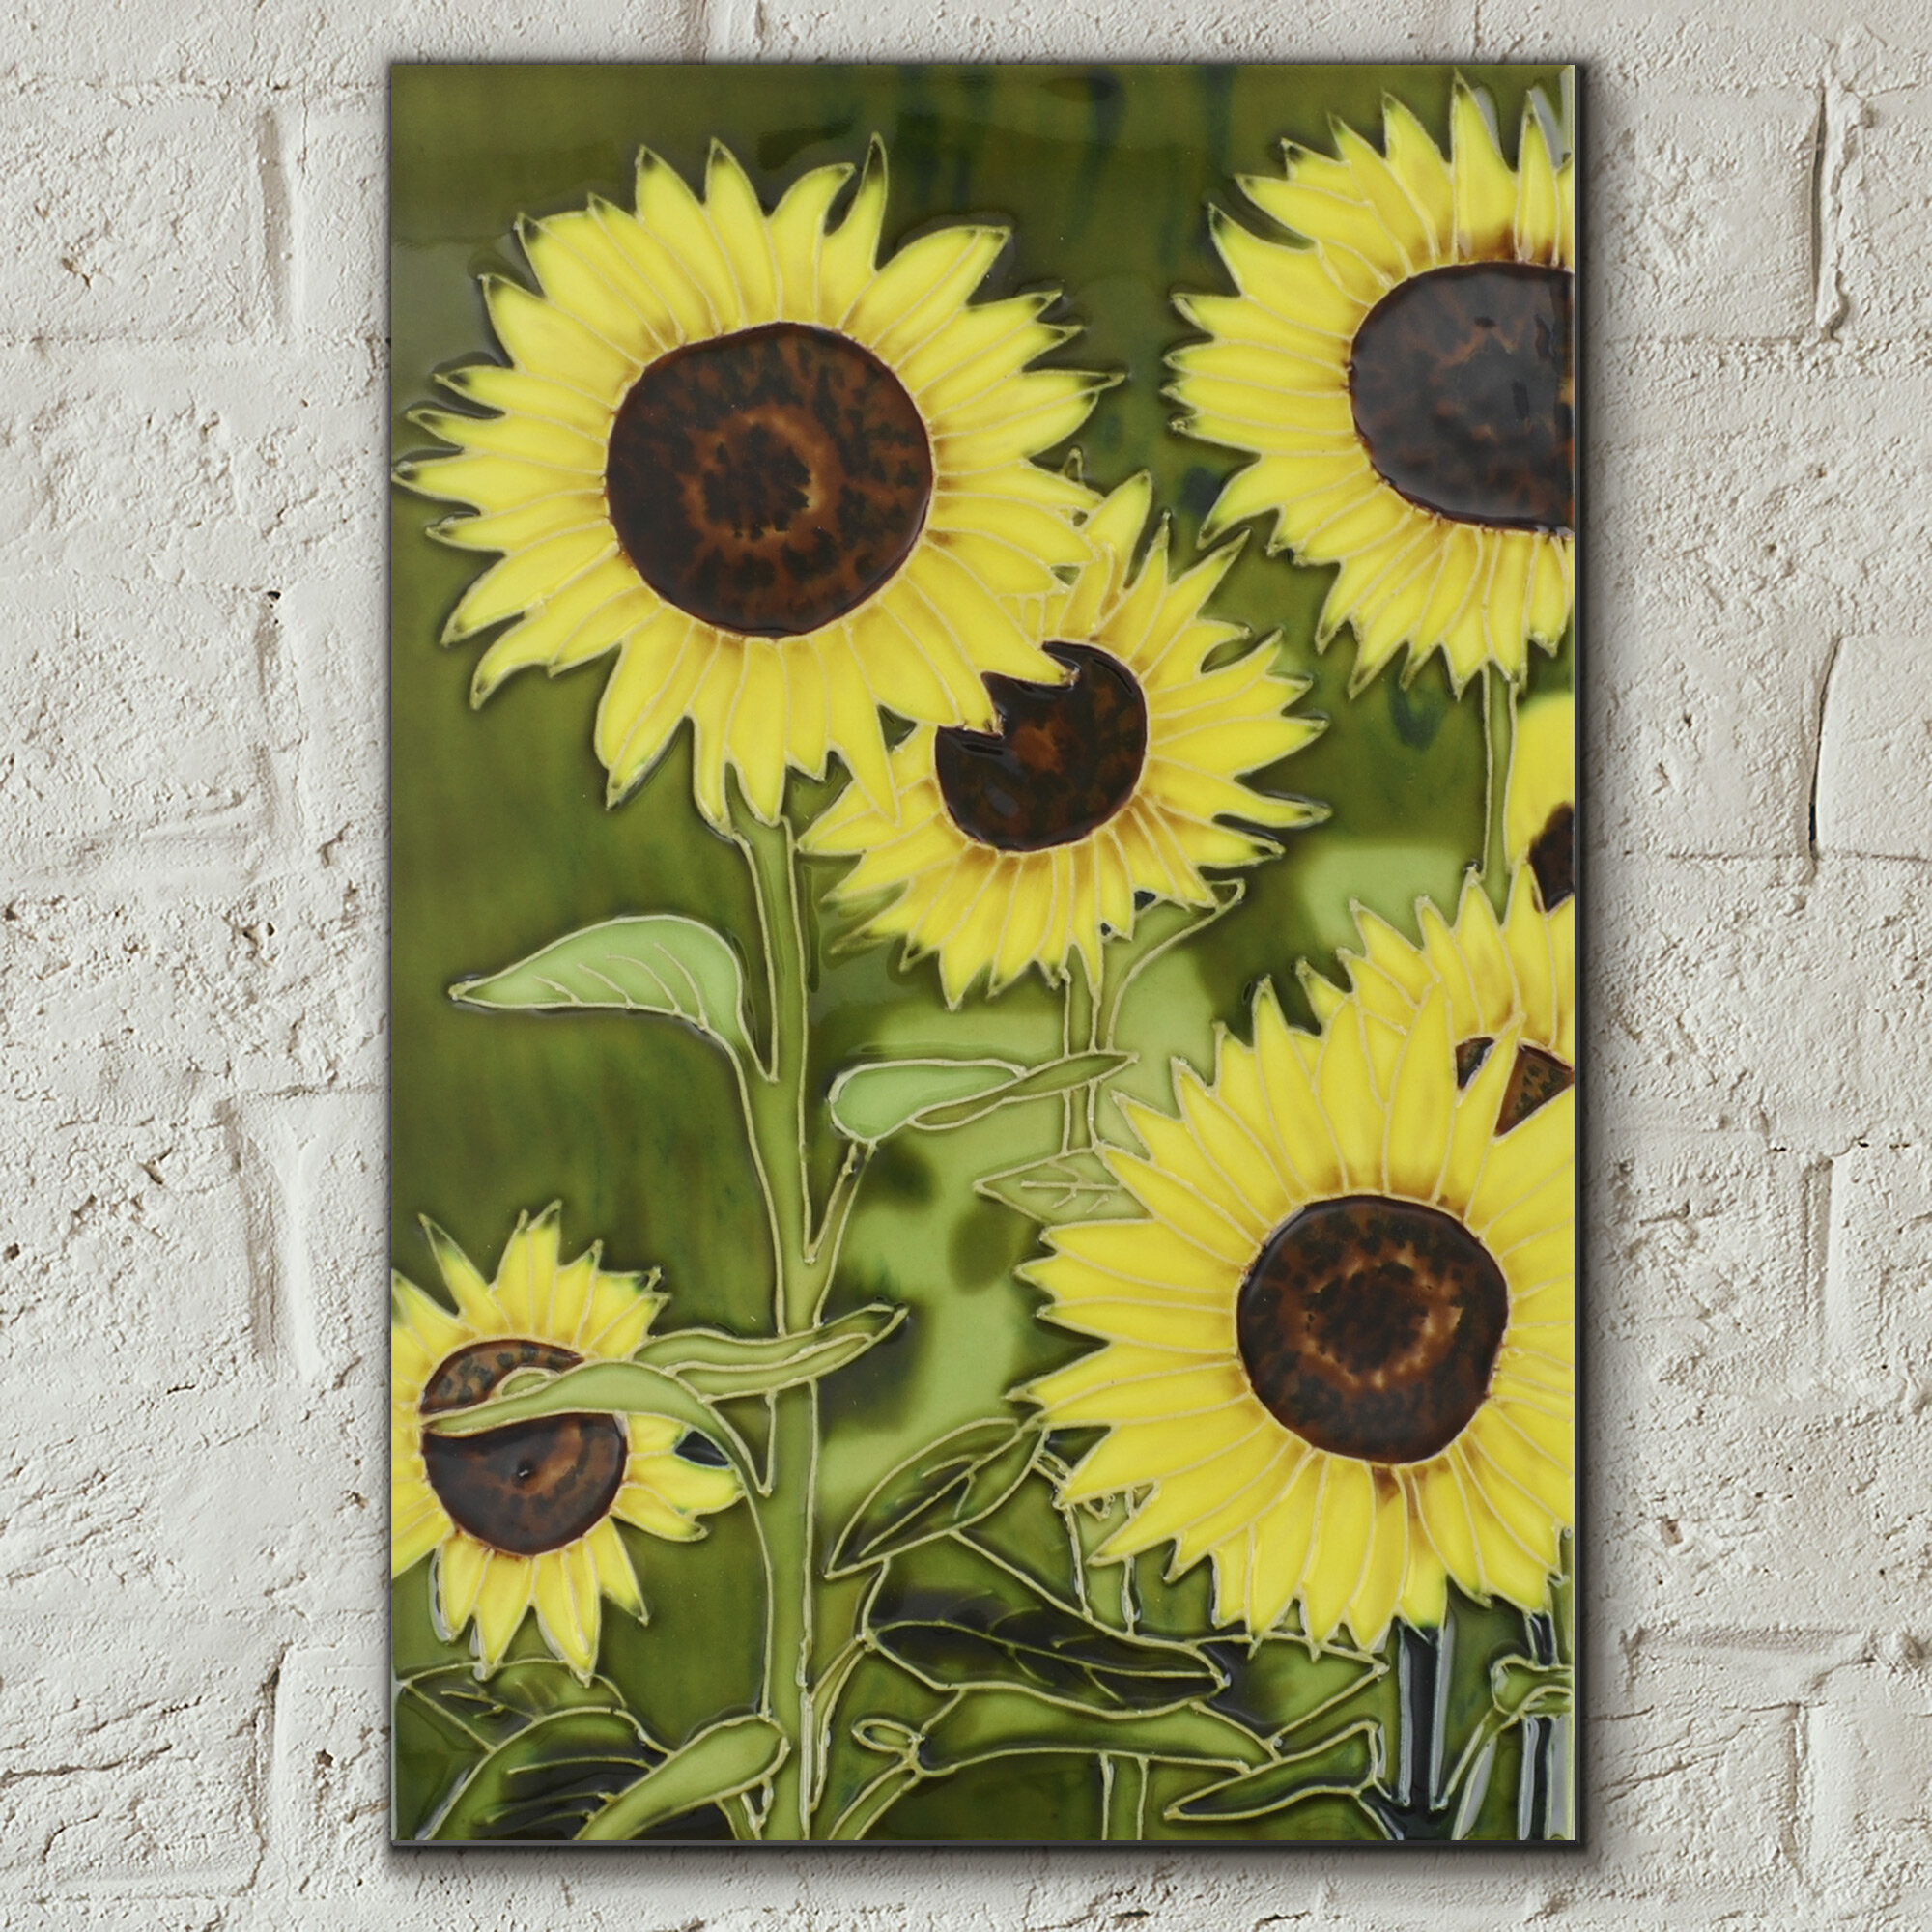 Castleton Home Hand Painted Sunflowers Floral Garden Wall Décor Tile ...